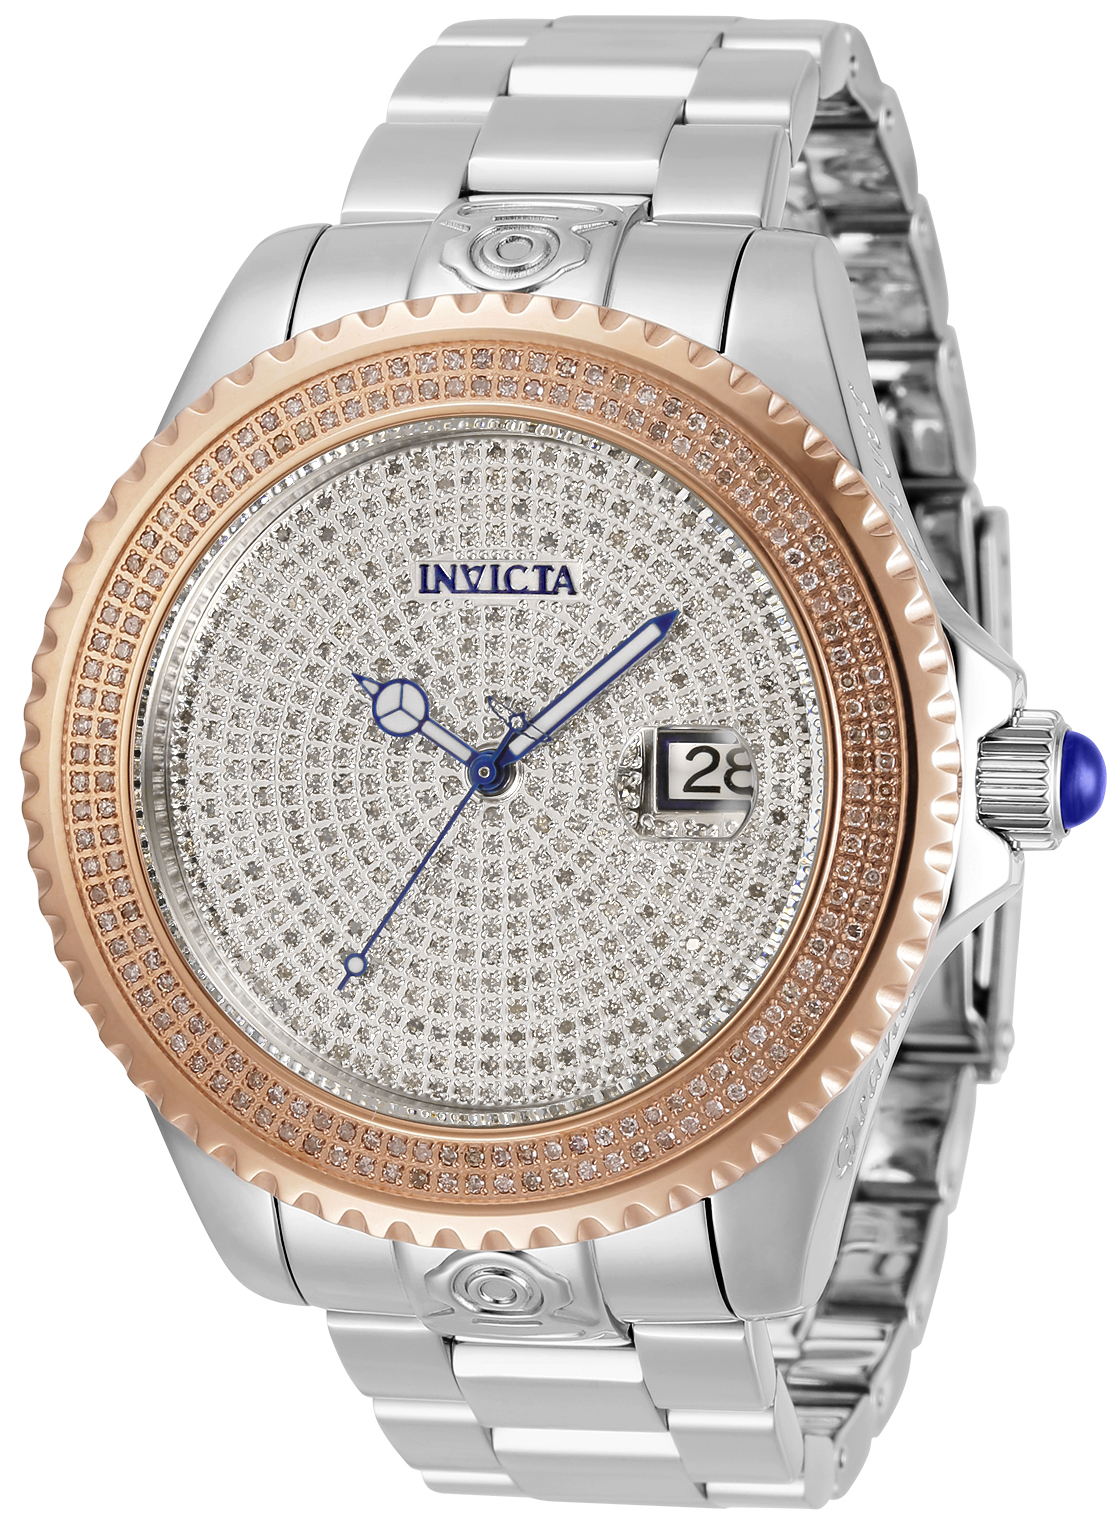 Invicta Pro Diver Automatic Mens Watch 2.68 Carat Diamond 47mm - Model 31058